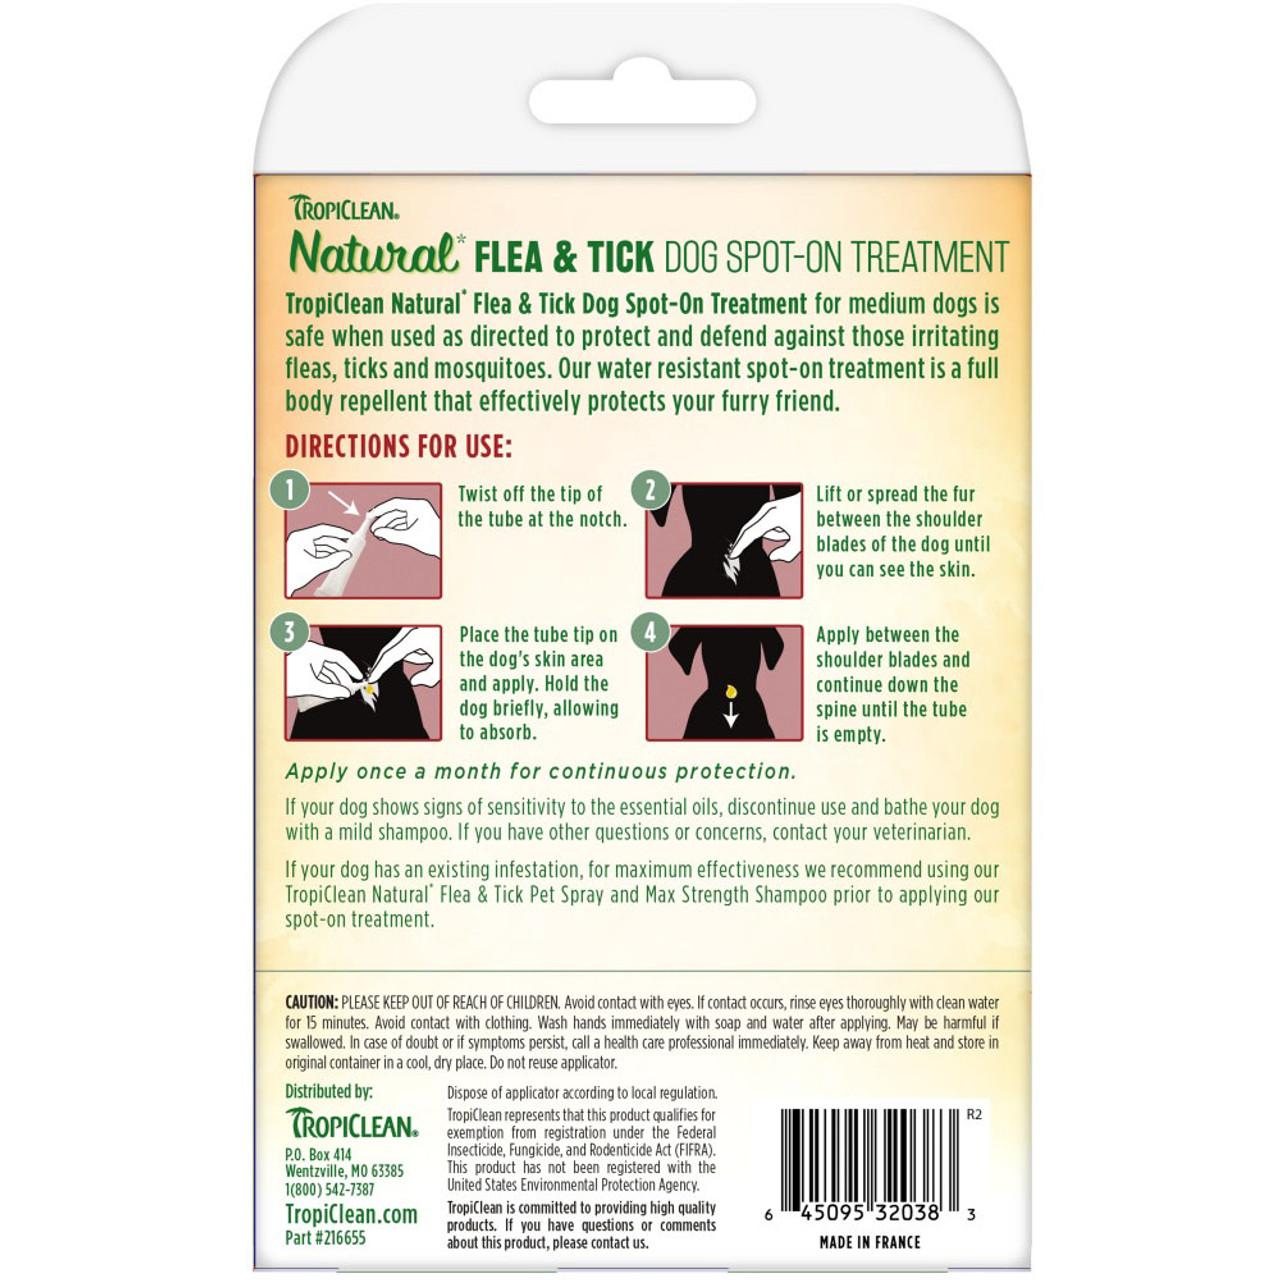 TropiClean Natural Flea & Tick Spot On Treatment for Medium Dogs (35 - 75 lbs) - Back